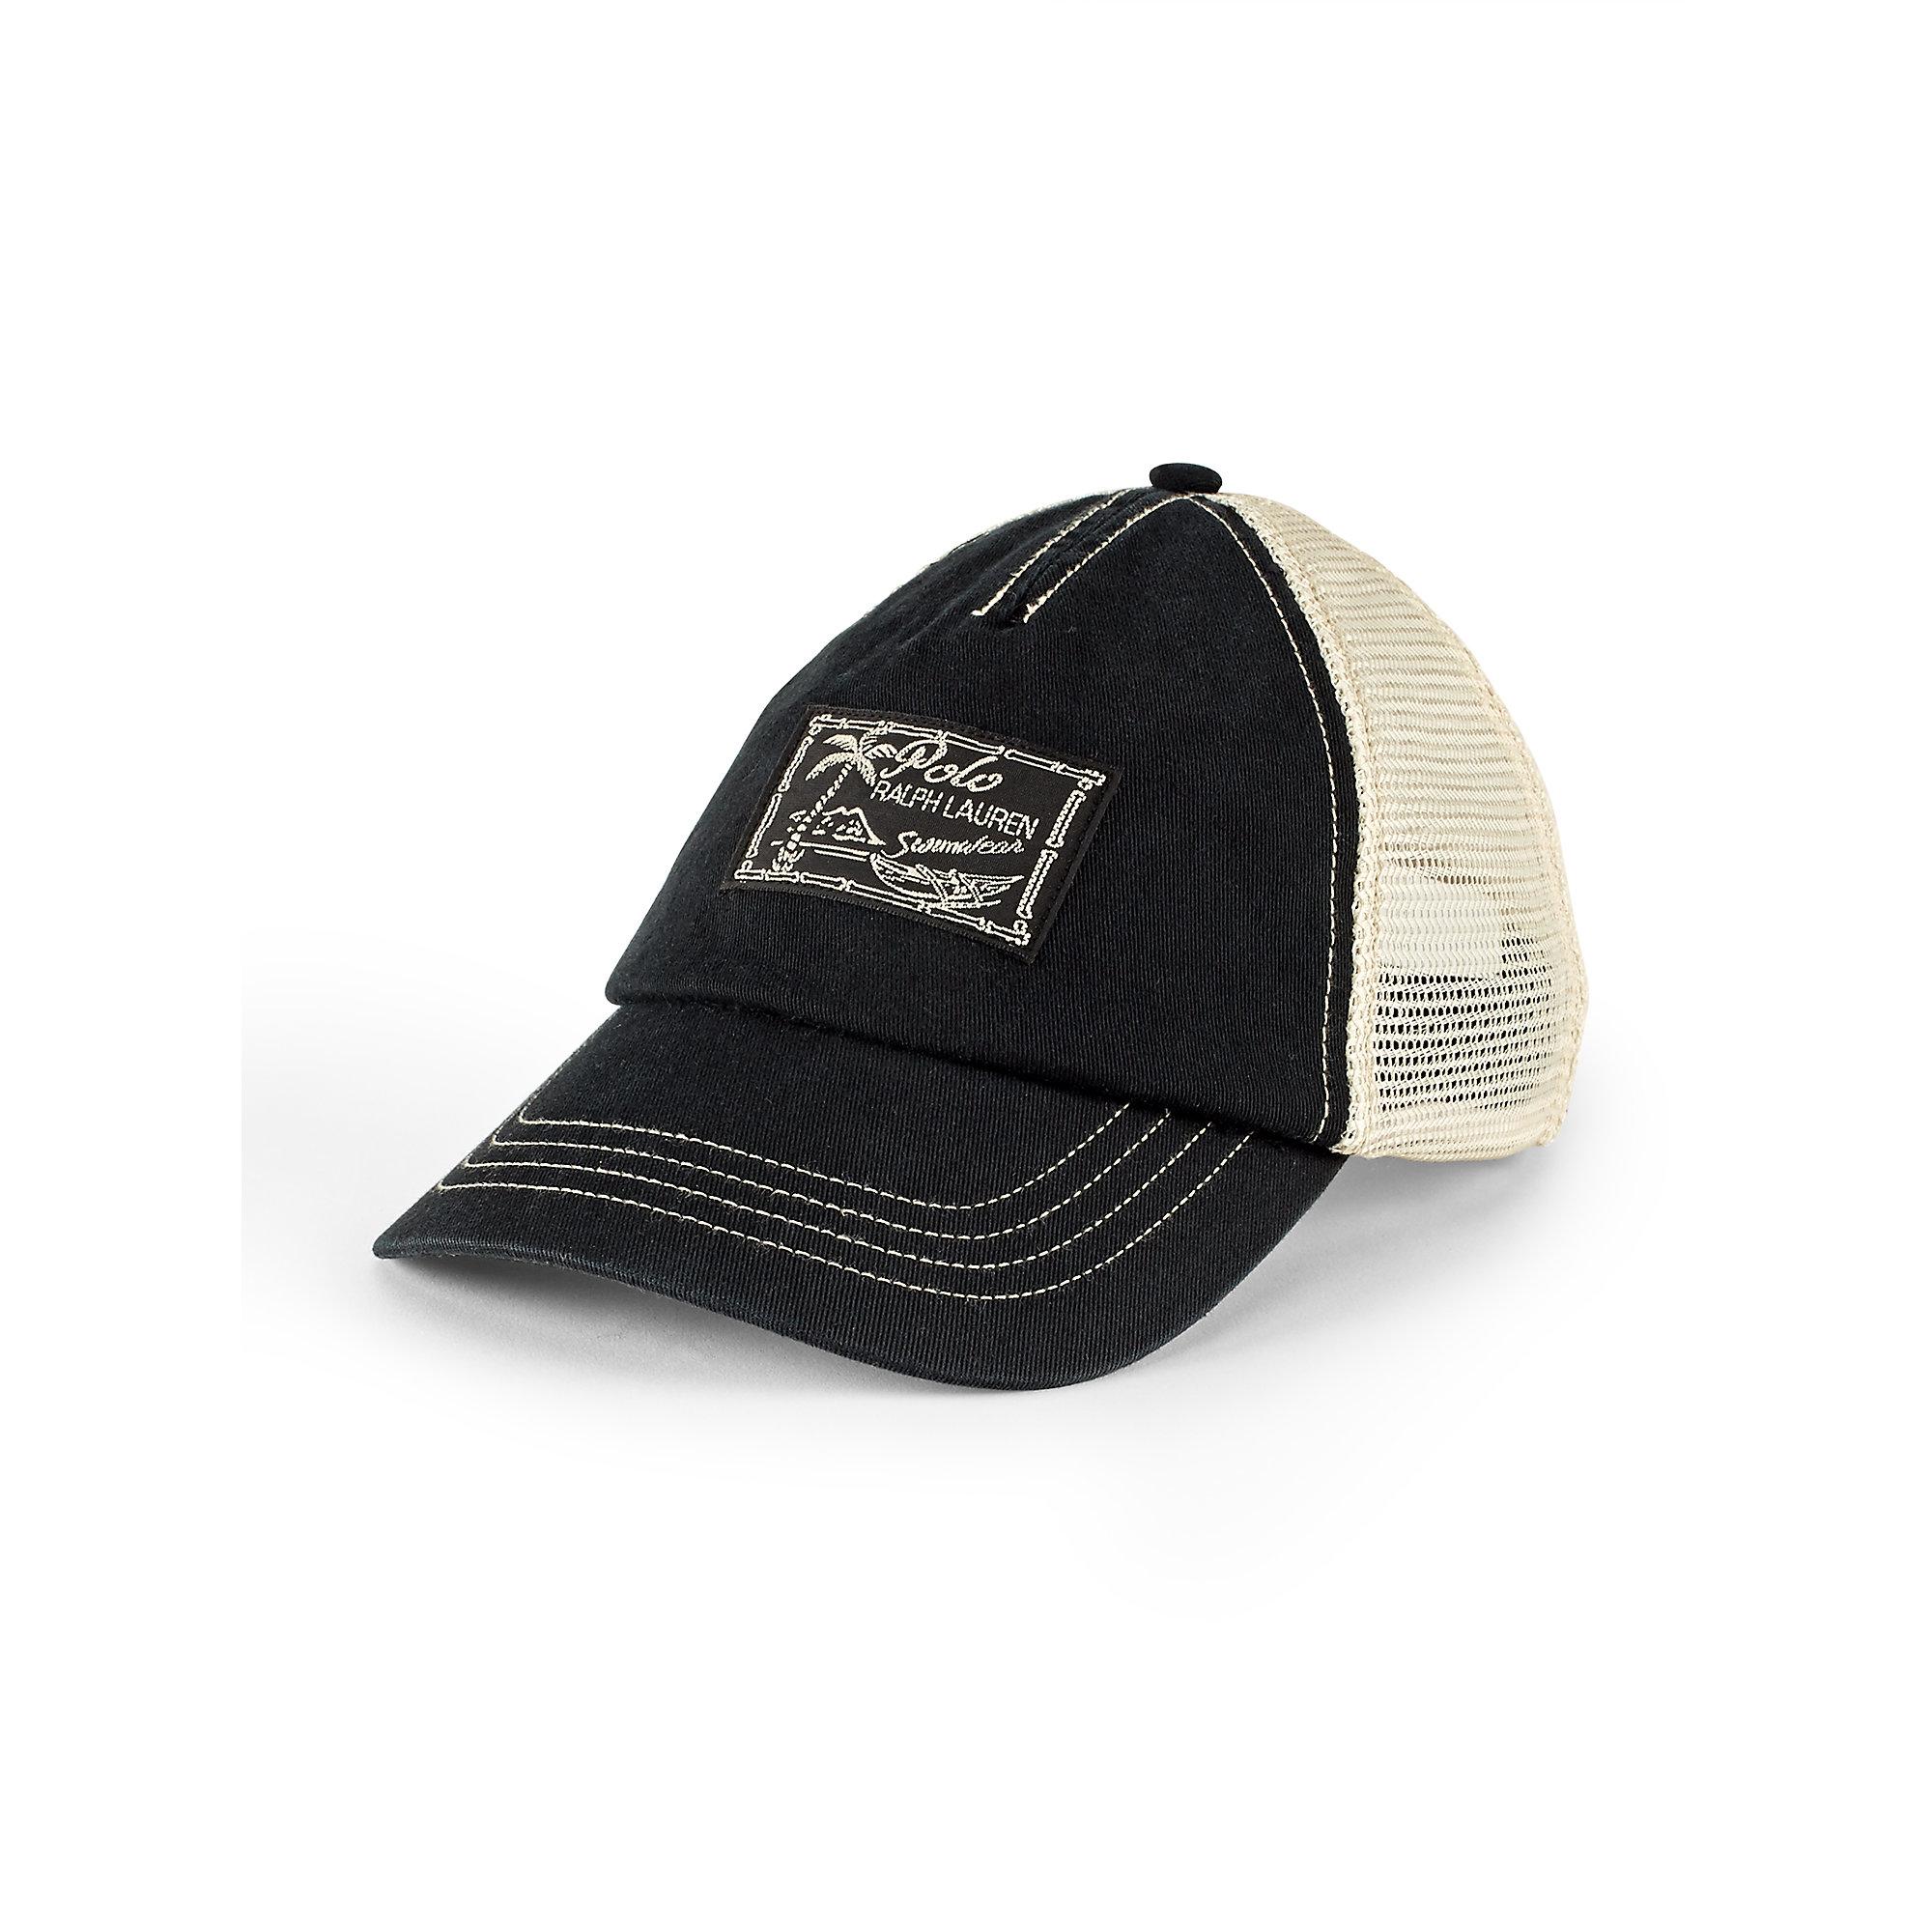 polo ralph lauren mesh trucker cap in black for men lyst. Black Bedroom Furniture Sets. Home Design Ideas